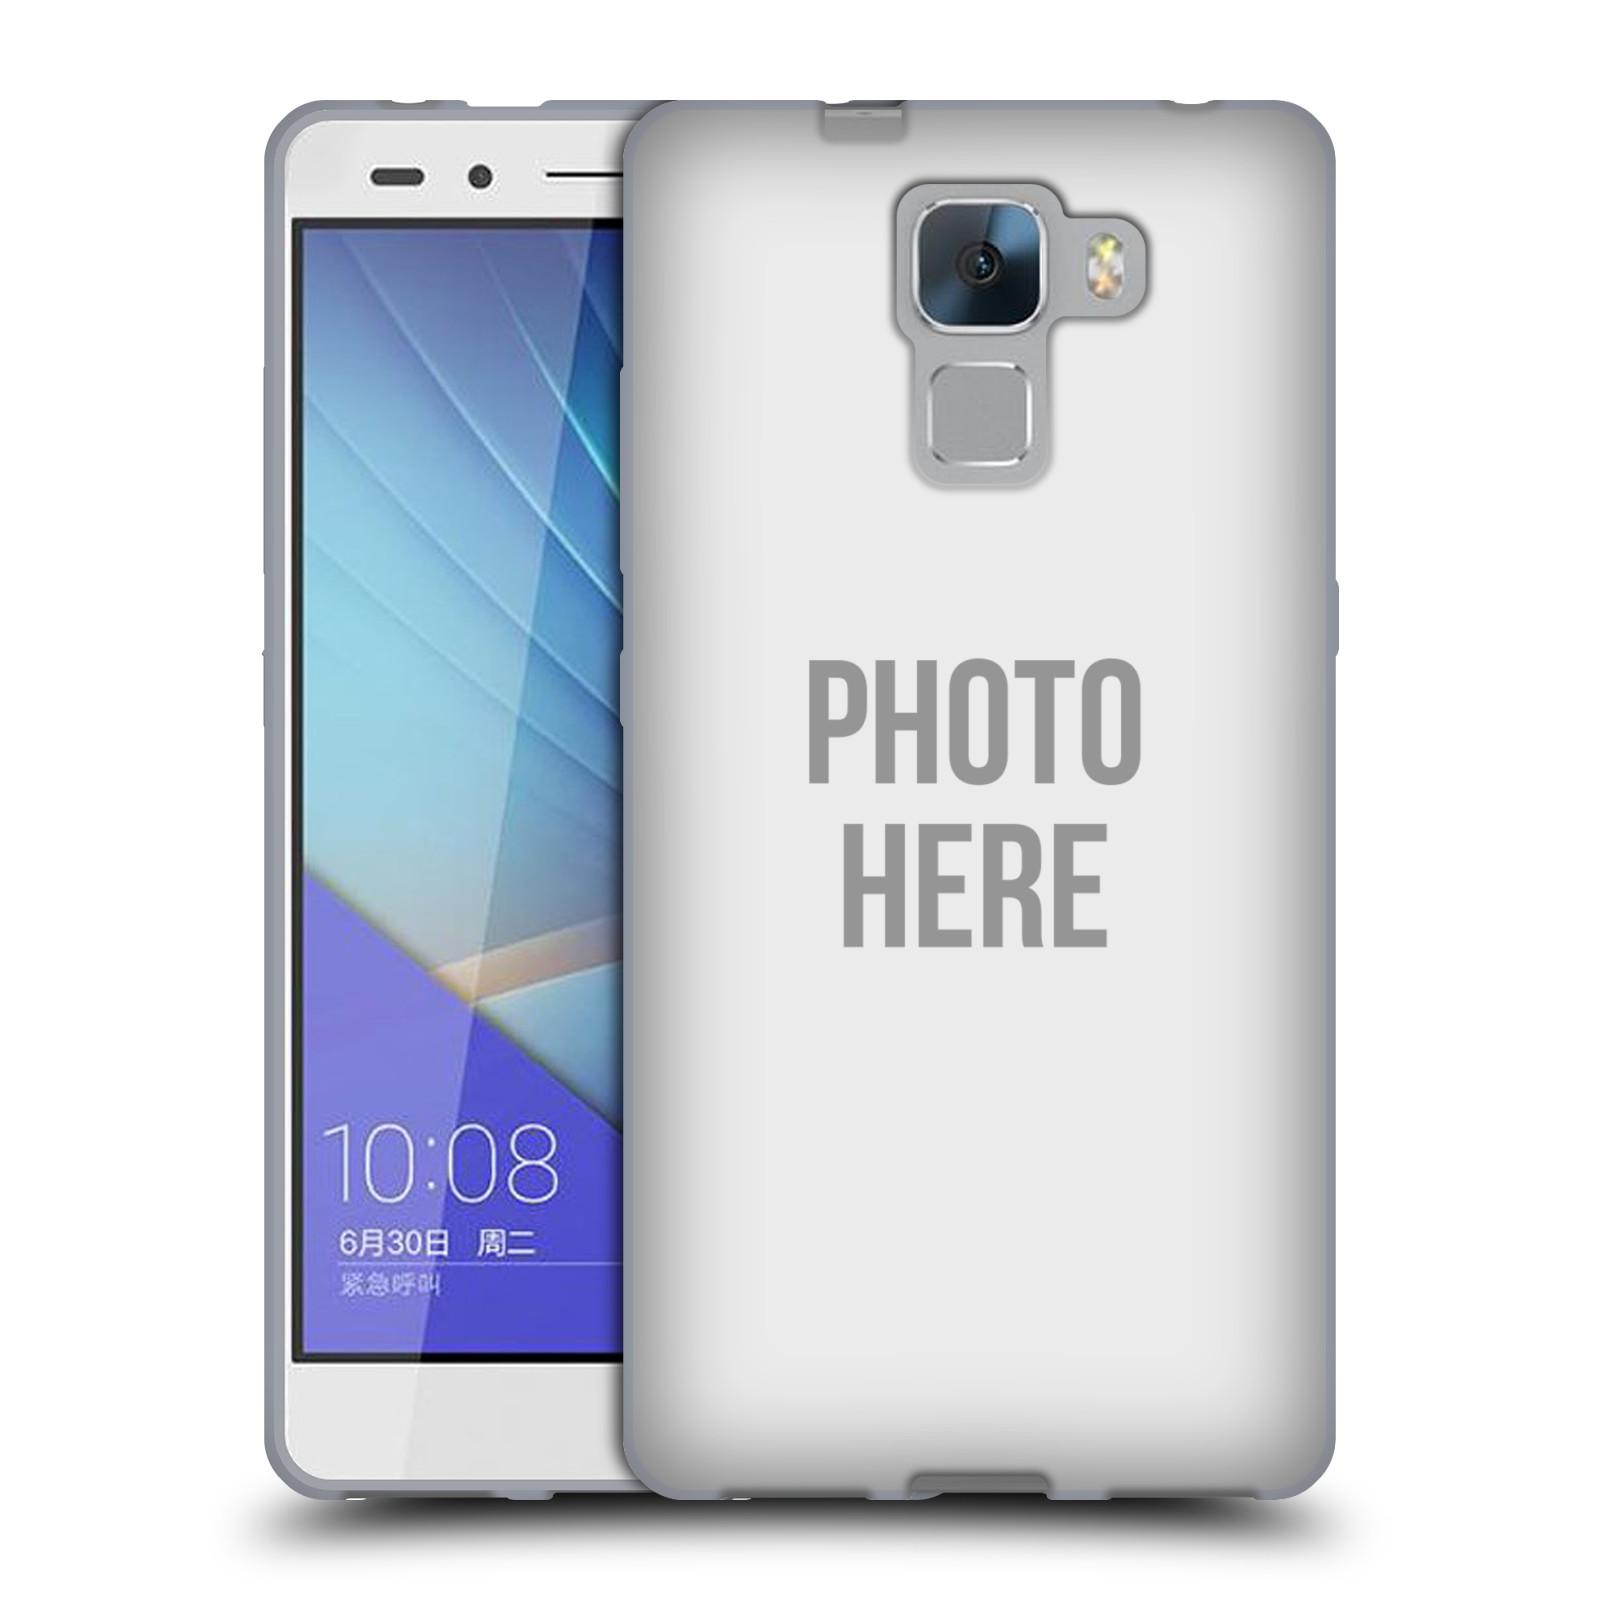 Silikonové pouzdro na mobil Honor 7 HEAD CASE s vlastním motivem